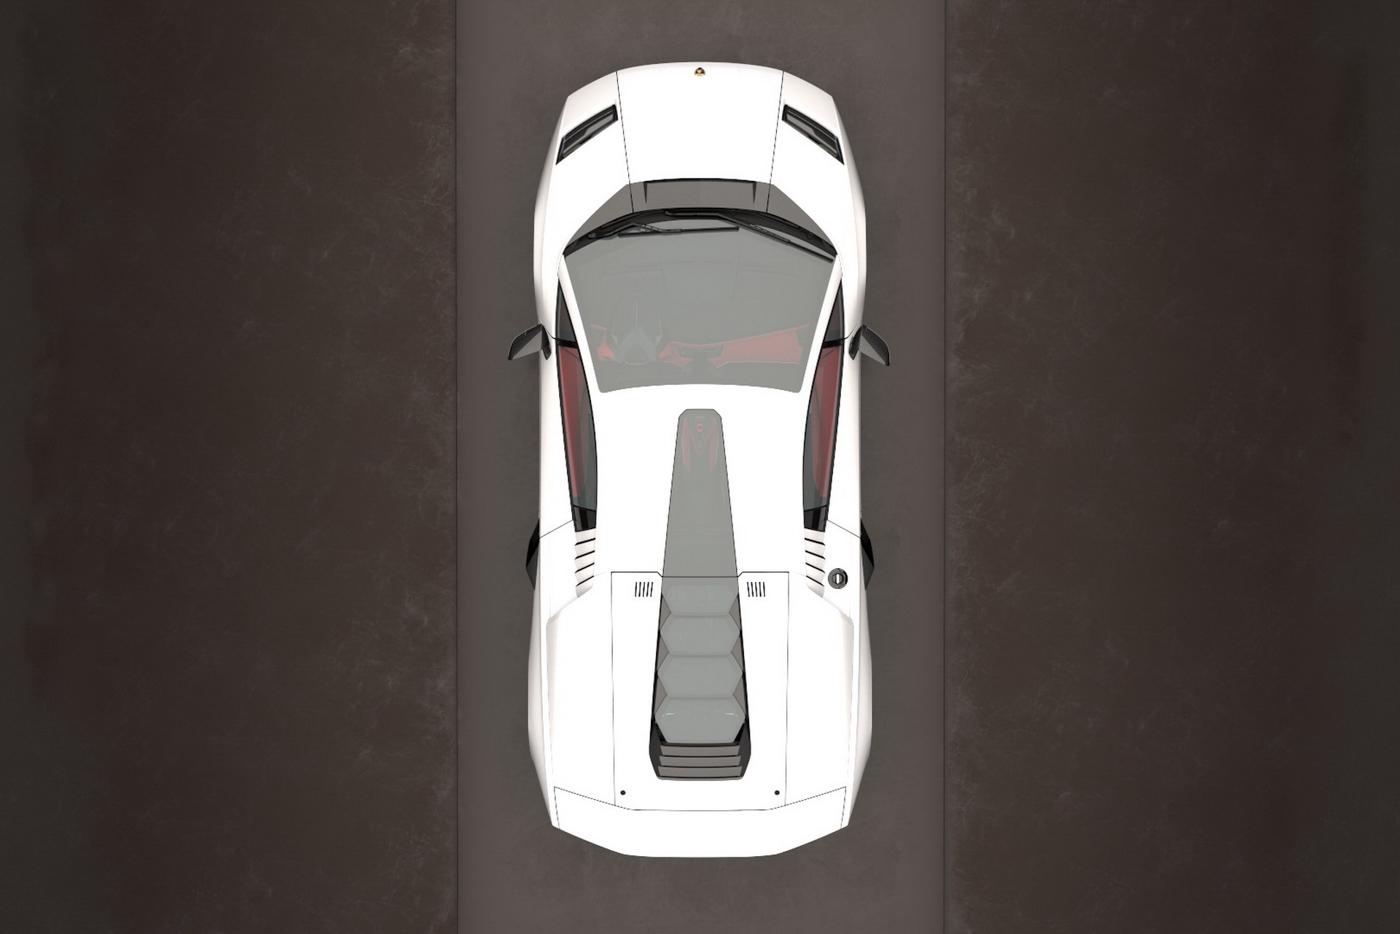 Lamborghini Countach LPI 800-4 (9).JPG